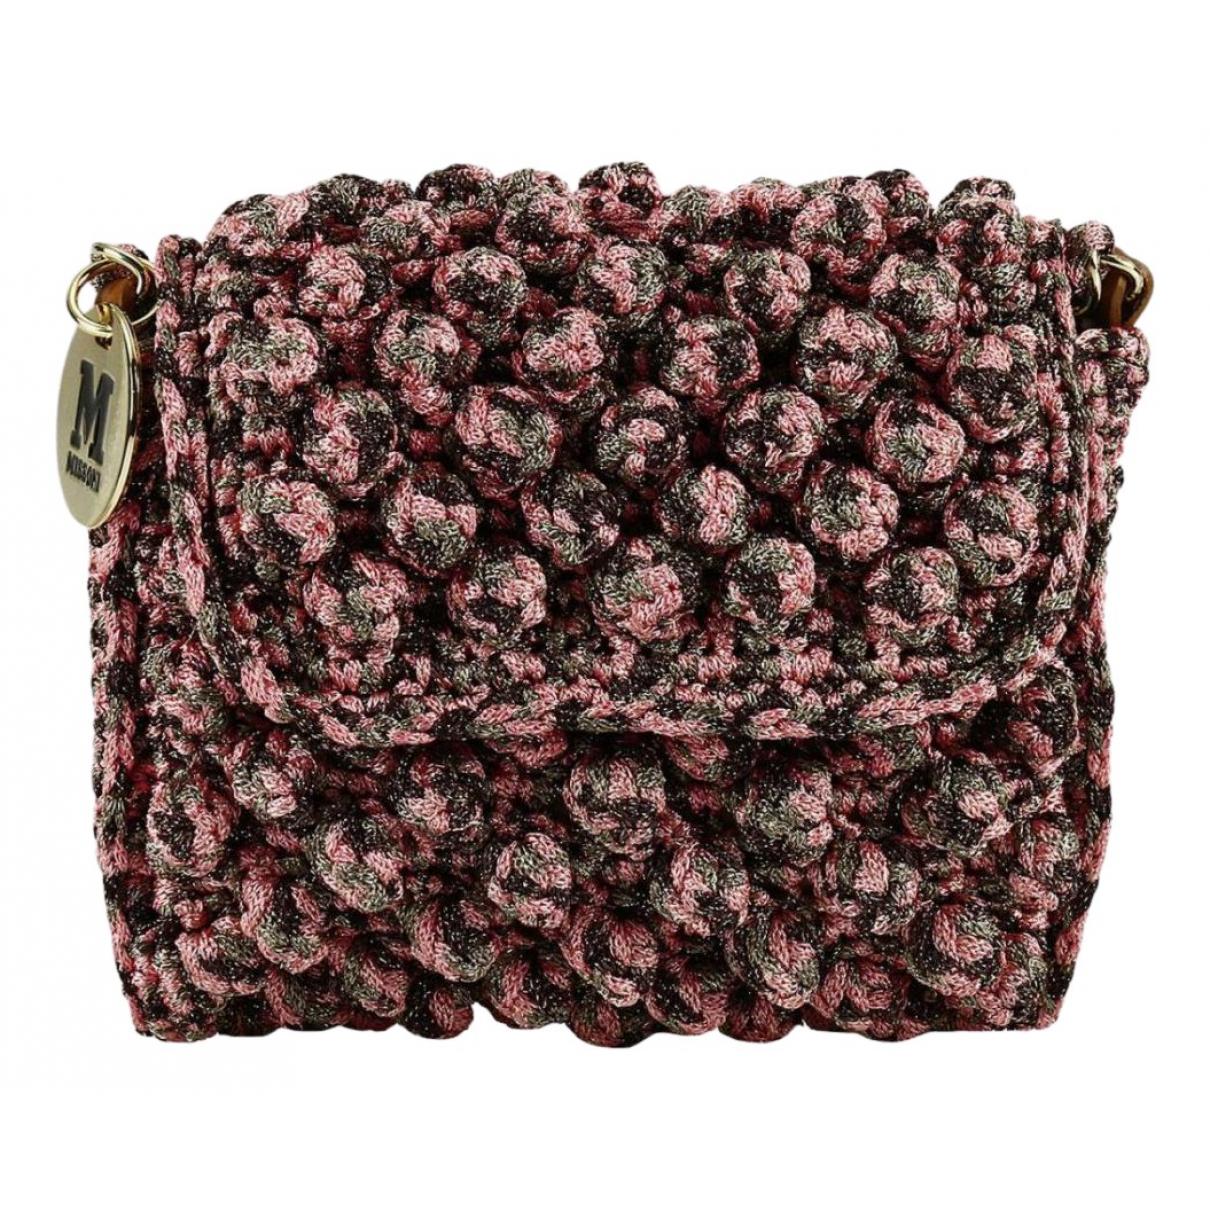 M Missoni \N Pink Cloth Clutch bag for Women \N